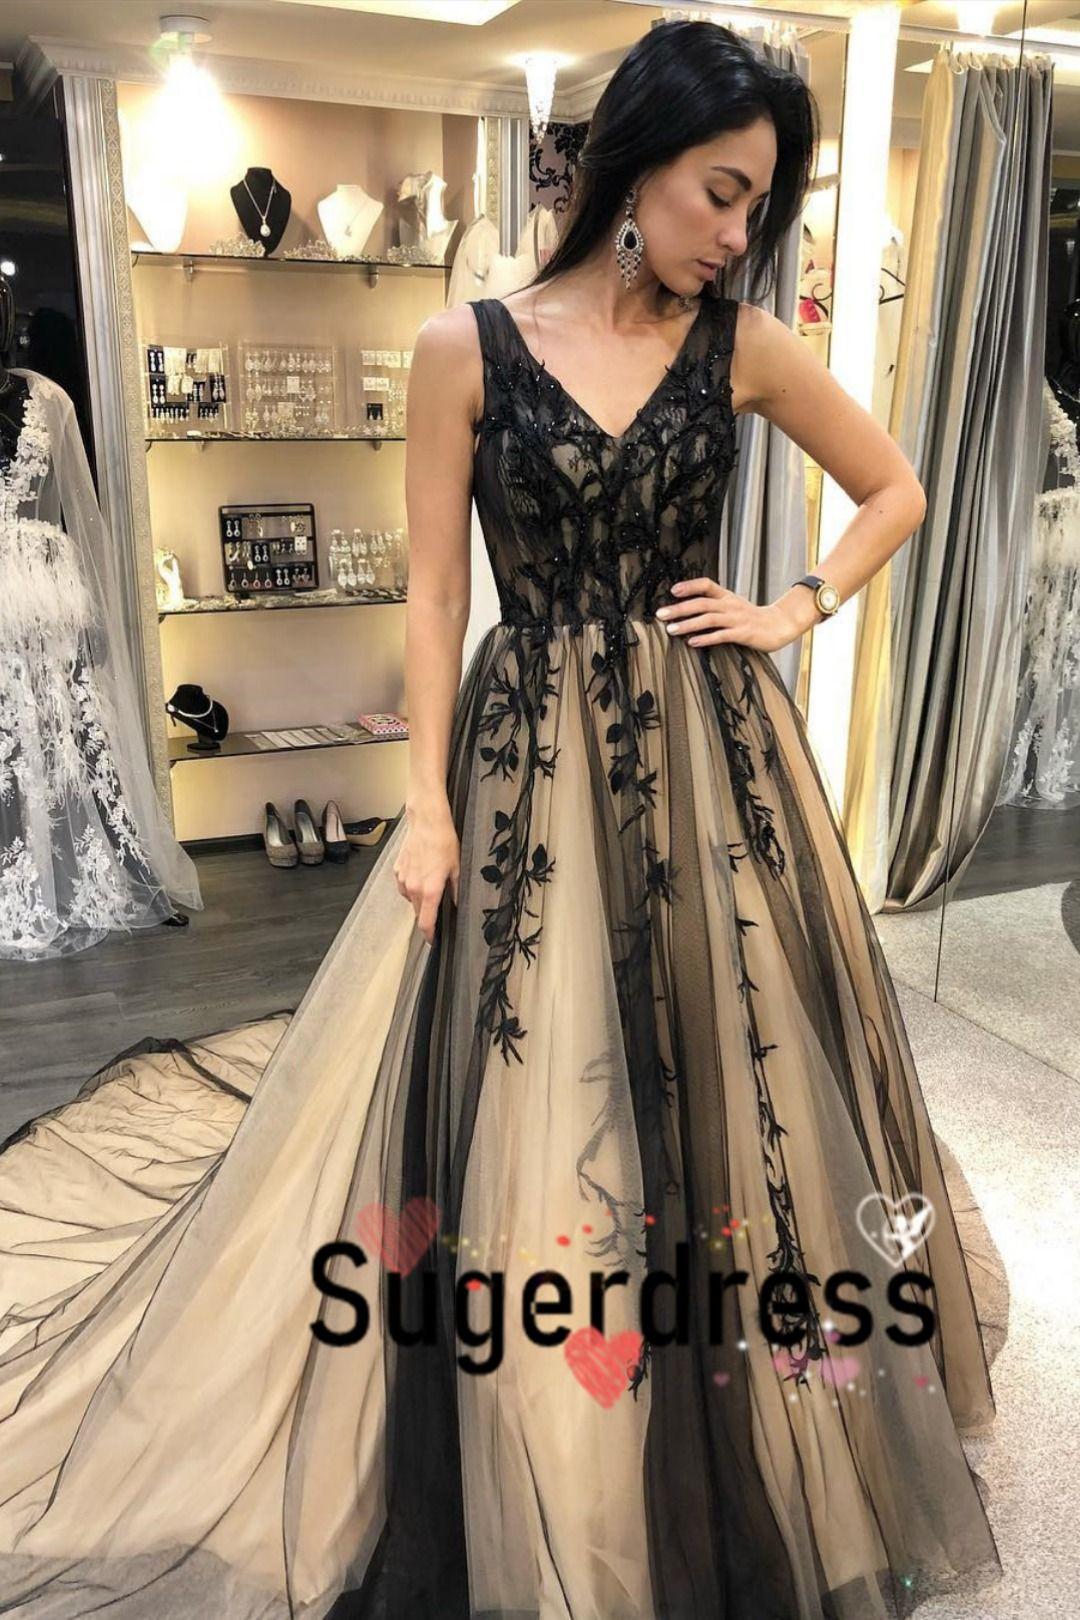 Gorgeous V Neck Black Long Graduation Dress In 2021 Graduation Dresses Long Formal Dresses Prom Dresses [ 1620 x 1080 Pixel ]